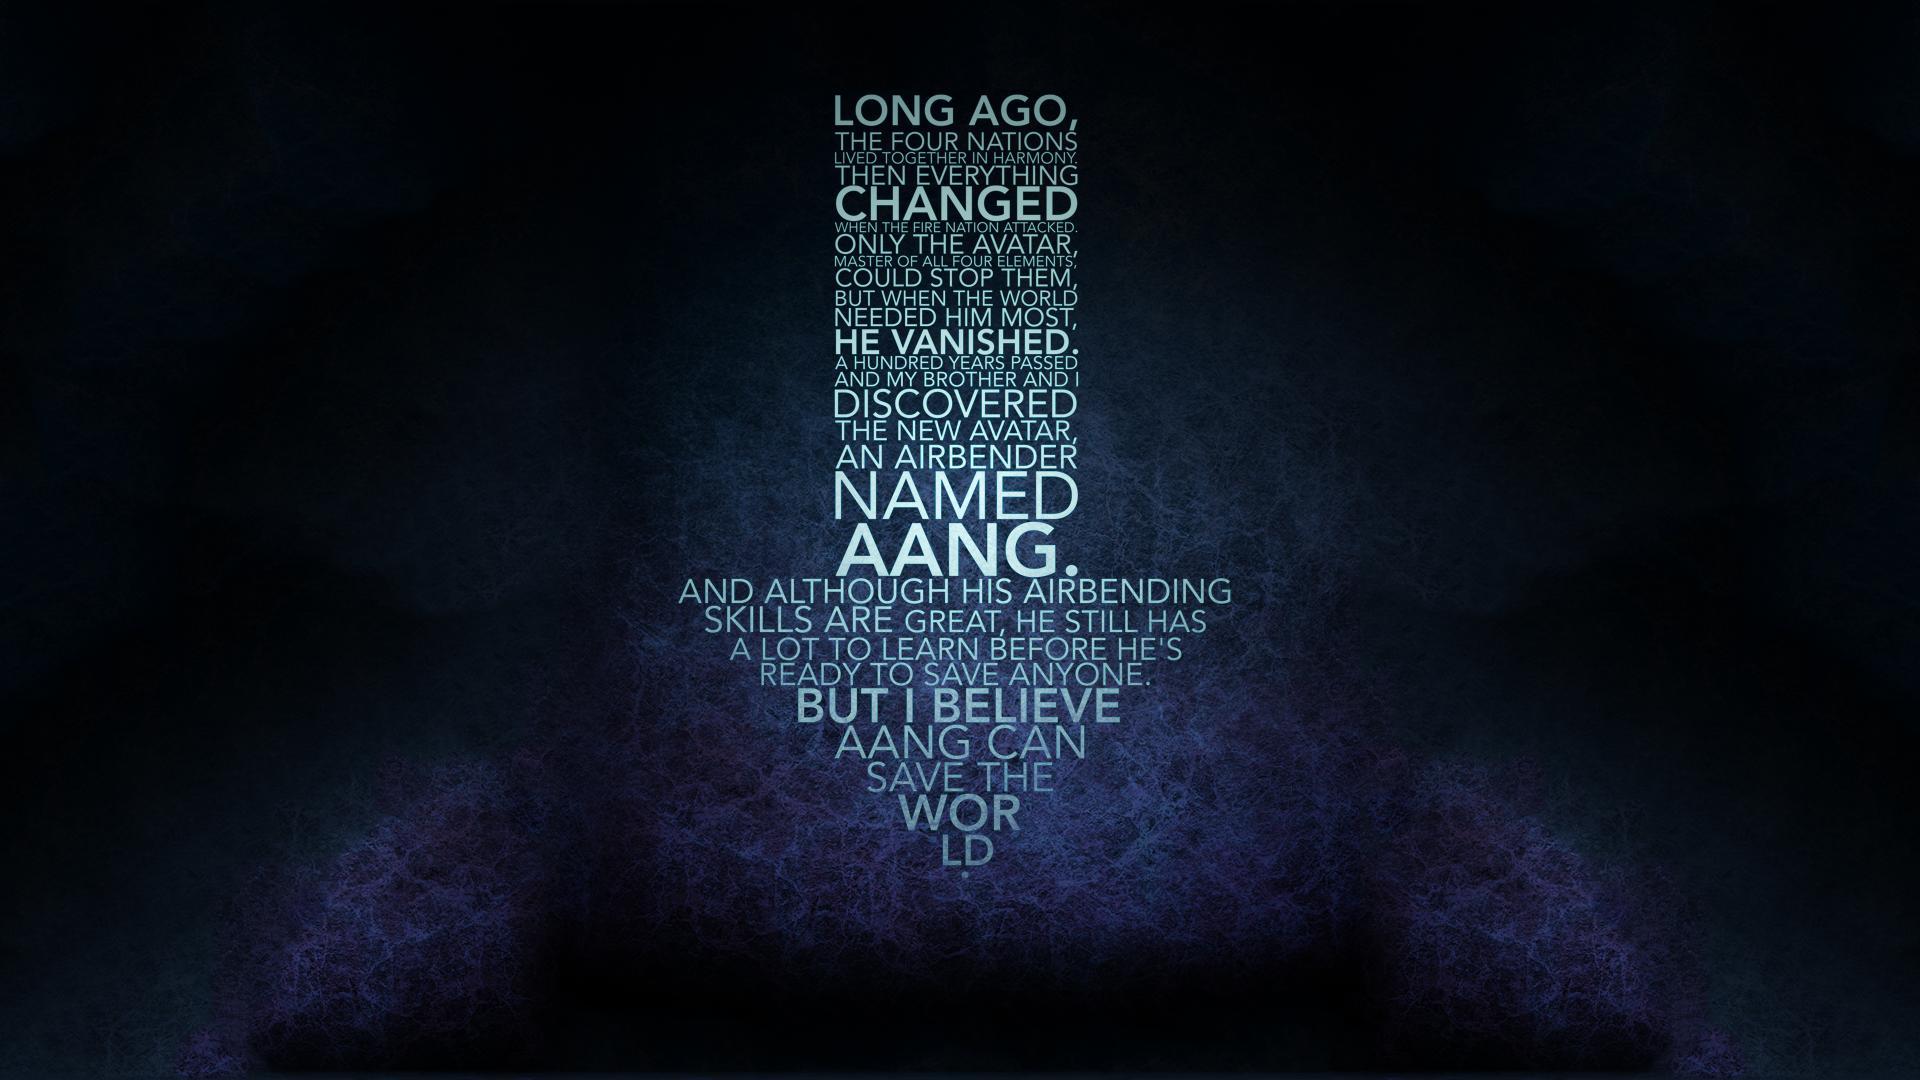 Avatar the last Airbender wallpaper (20)